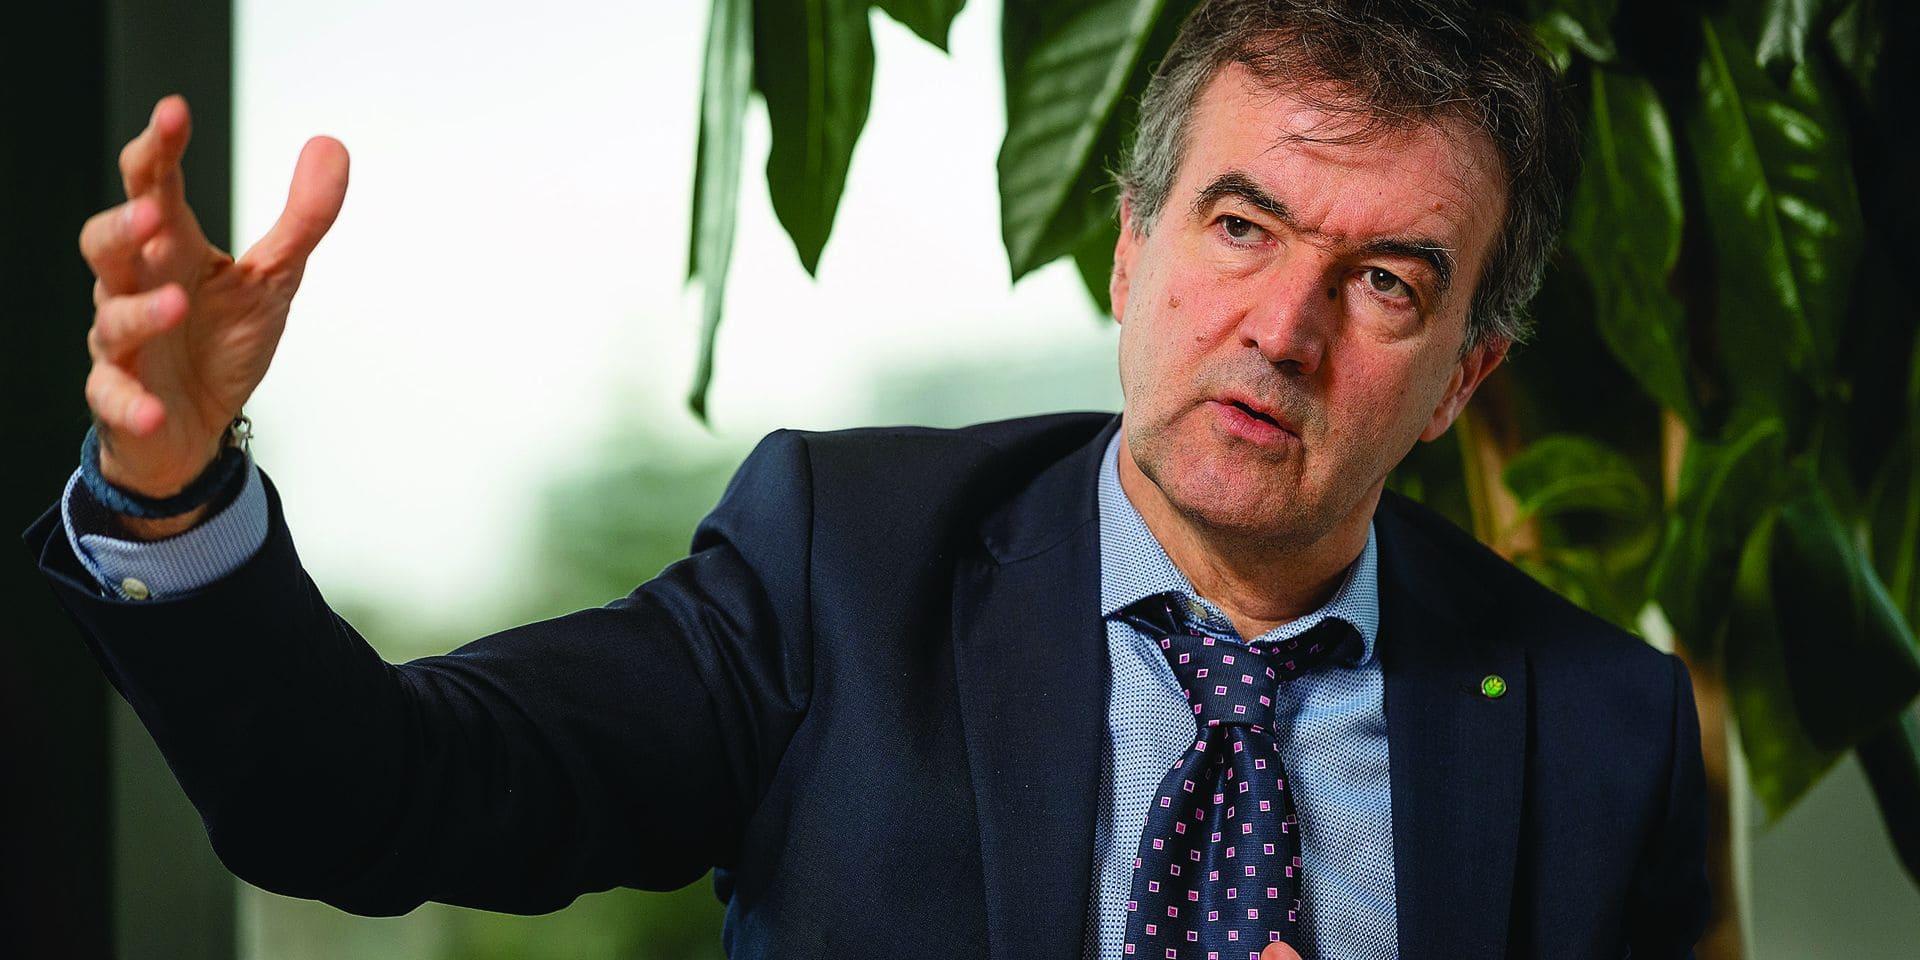 Bruxelels - Anderlecht: Philippe Voisin - CEO Crelan - Banque